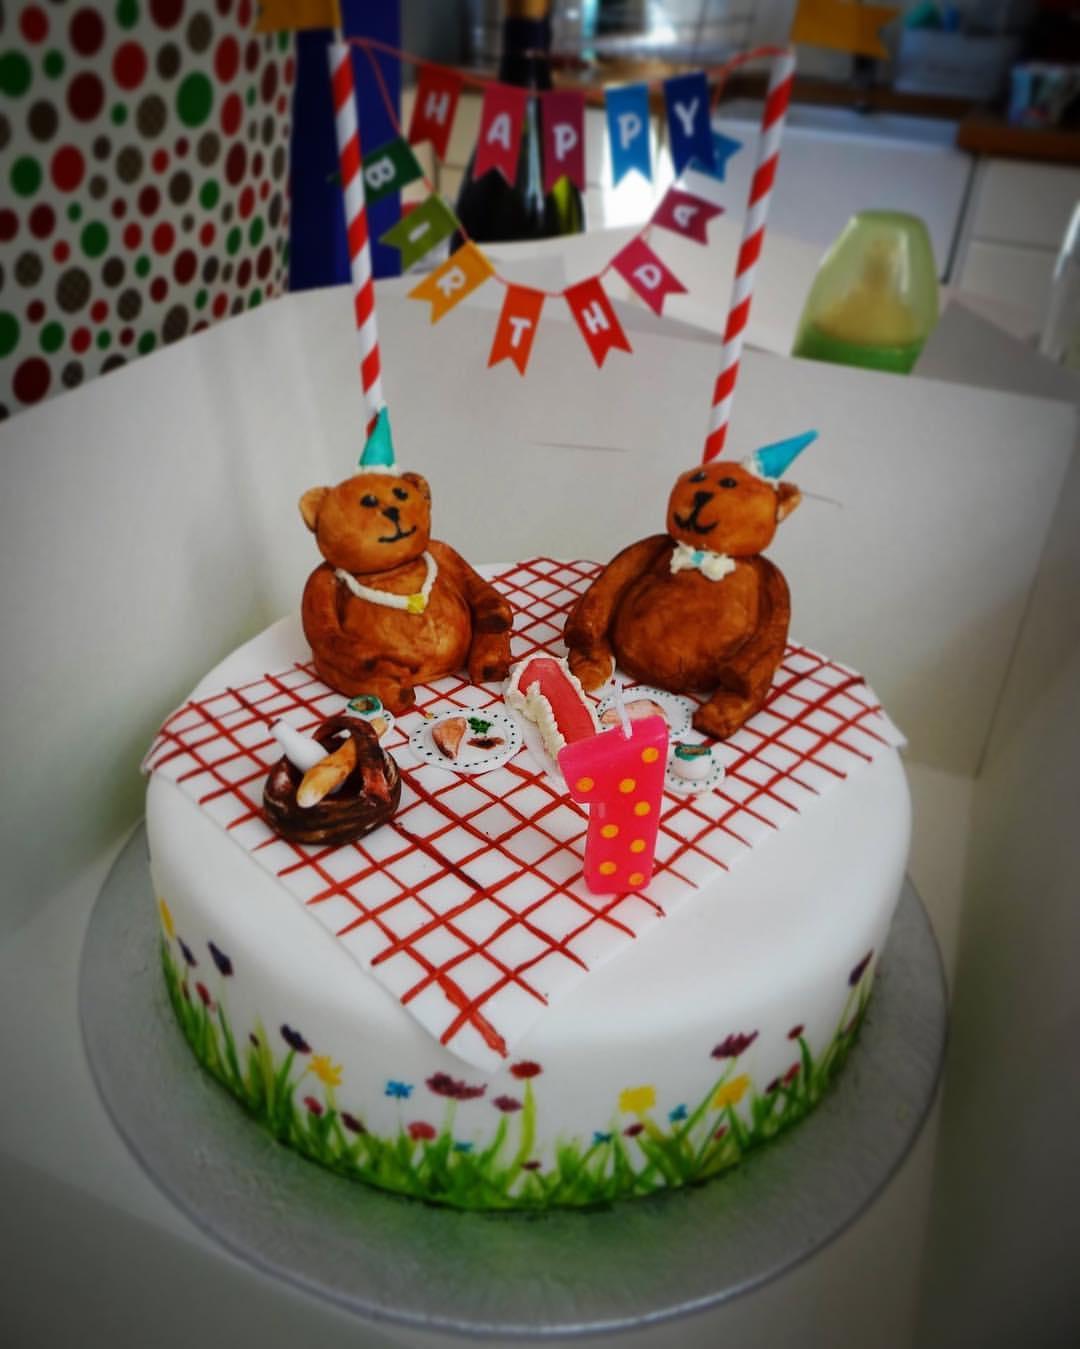 Teddy Bears' Picnic Cake